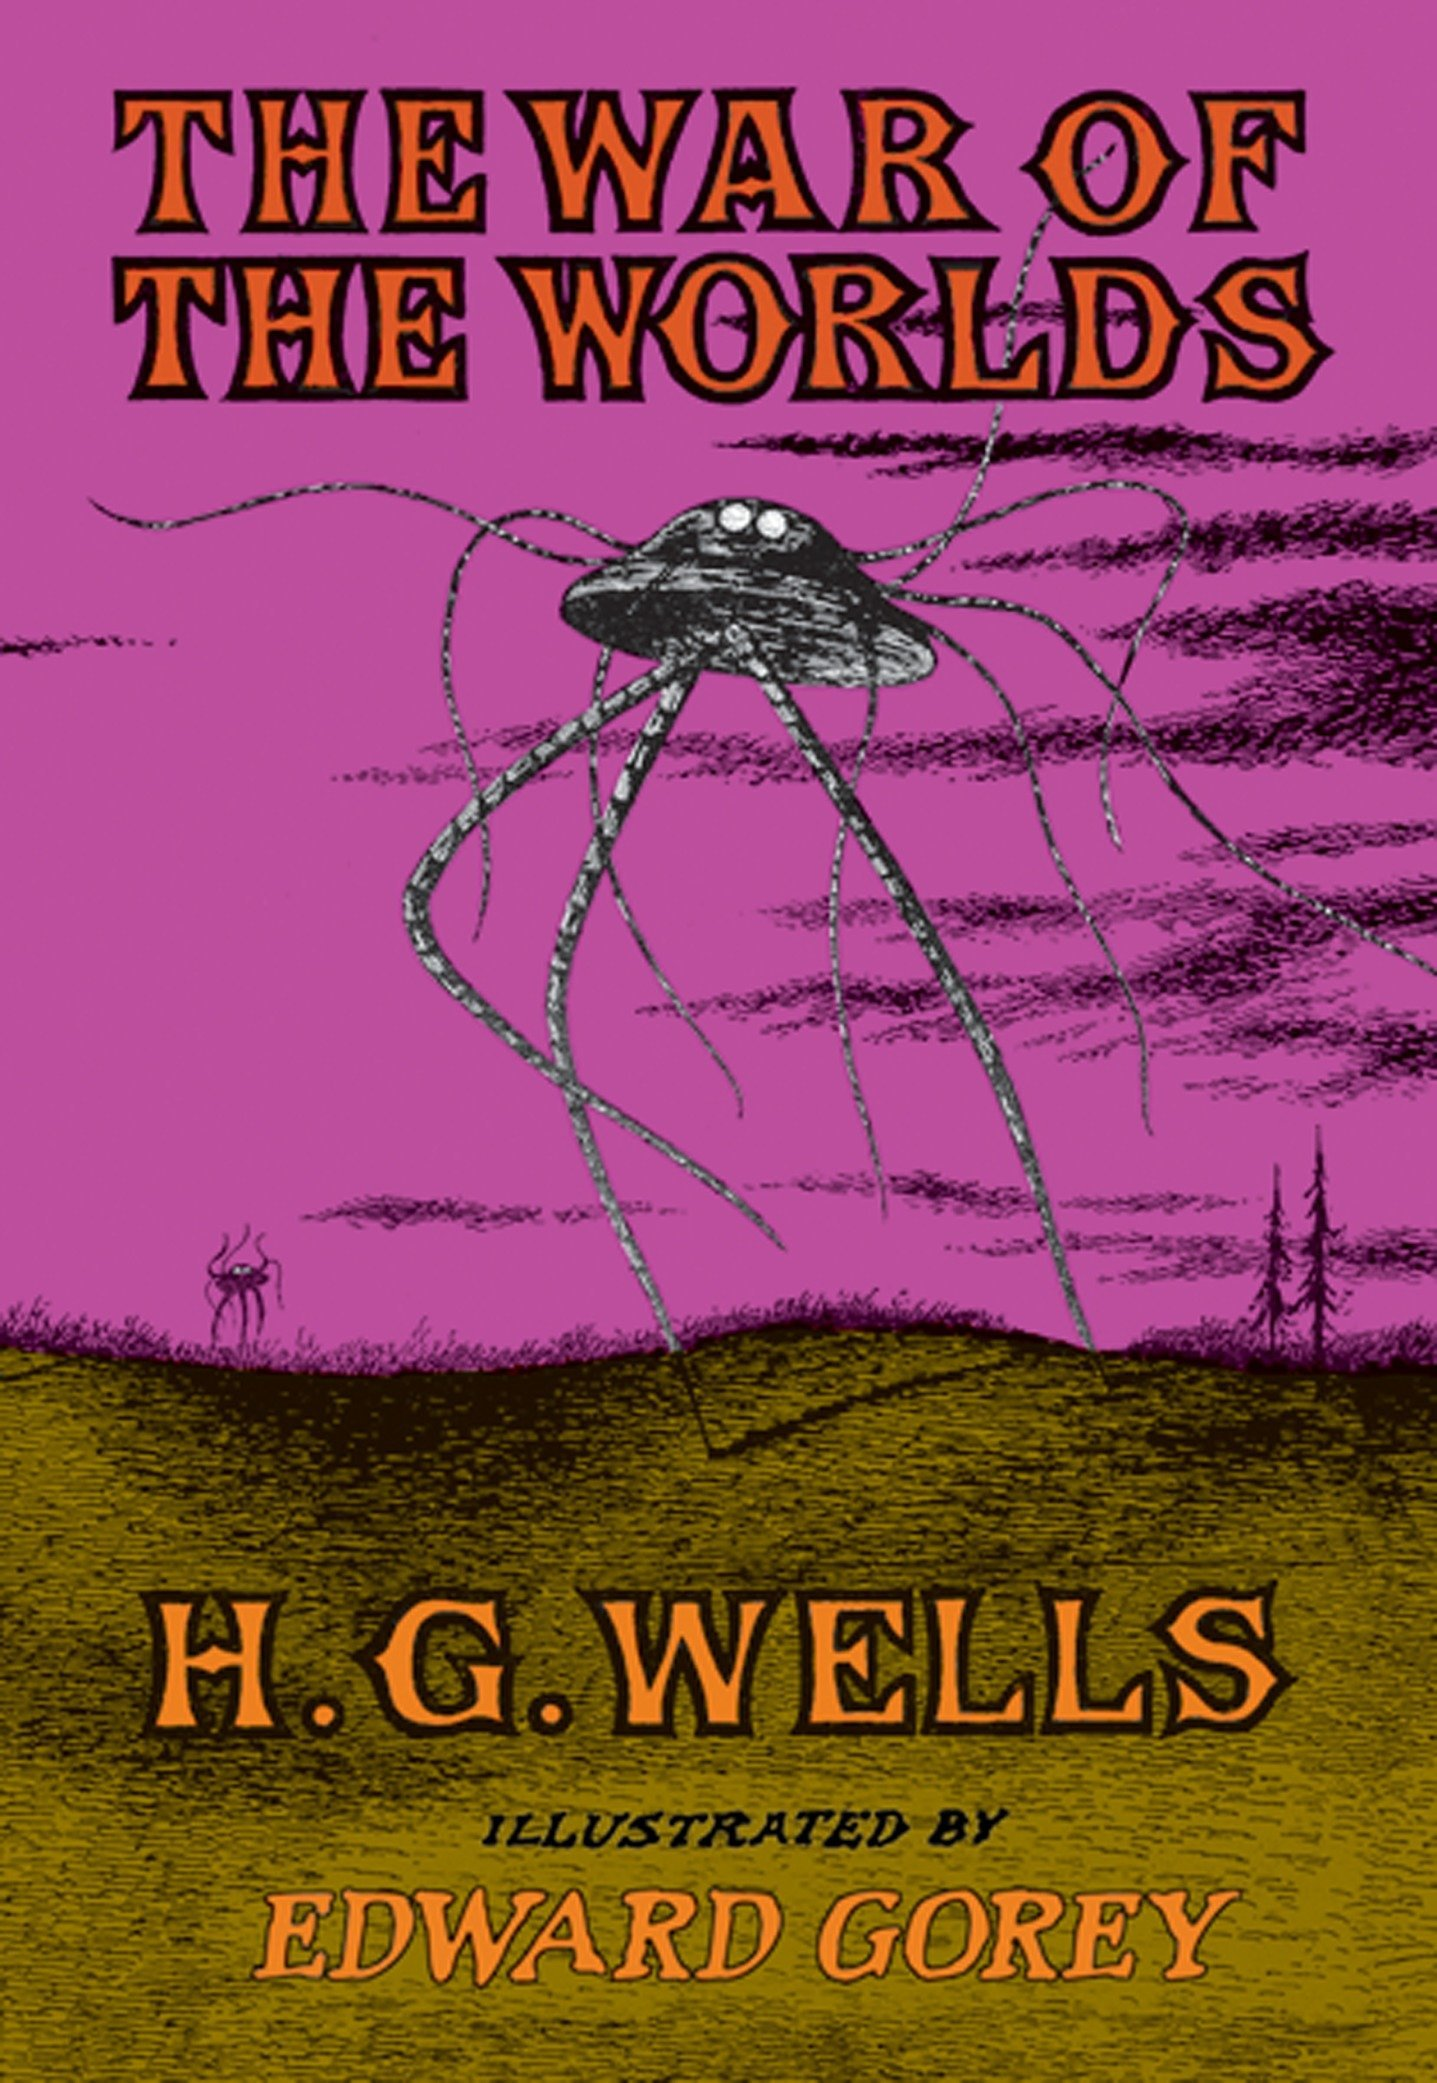 The War of the Worlds New York Review Books Classics: Amazon.es: Wells, H. G., Gorey, Edward: Libros en idiomas extranjeros